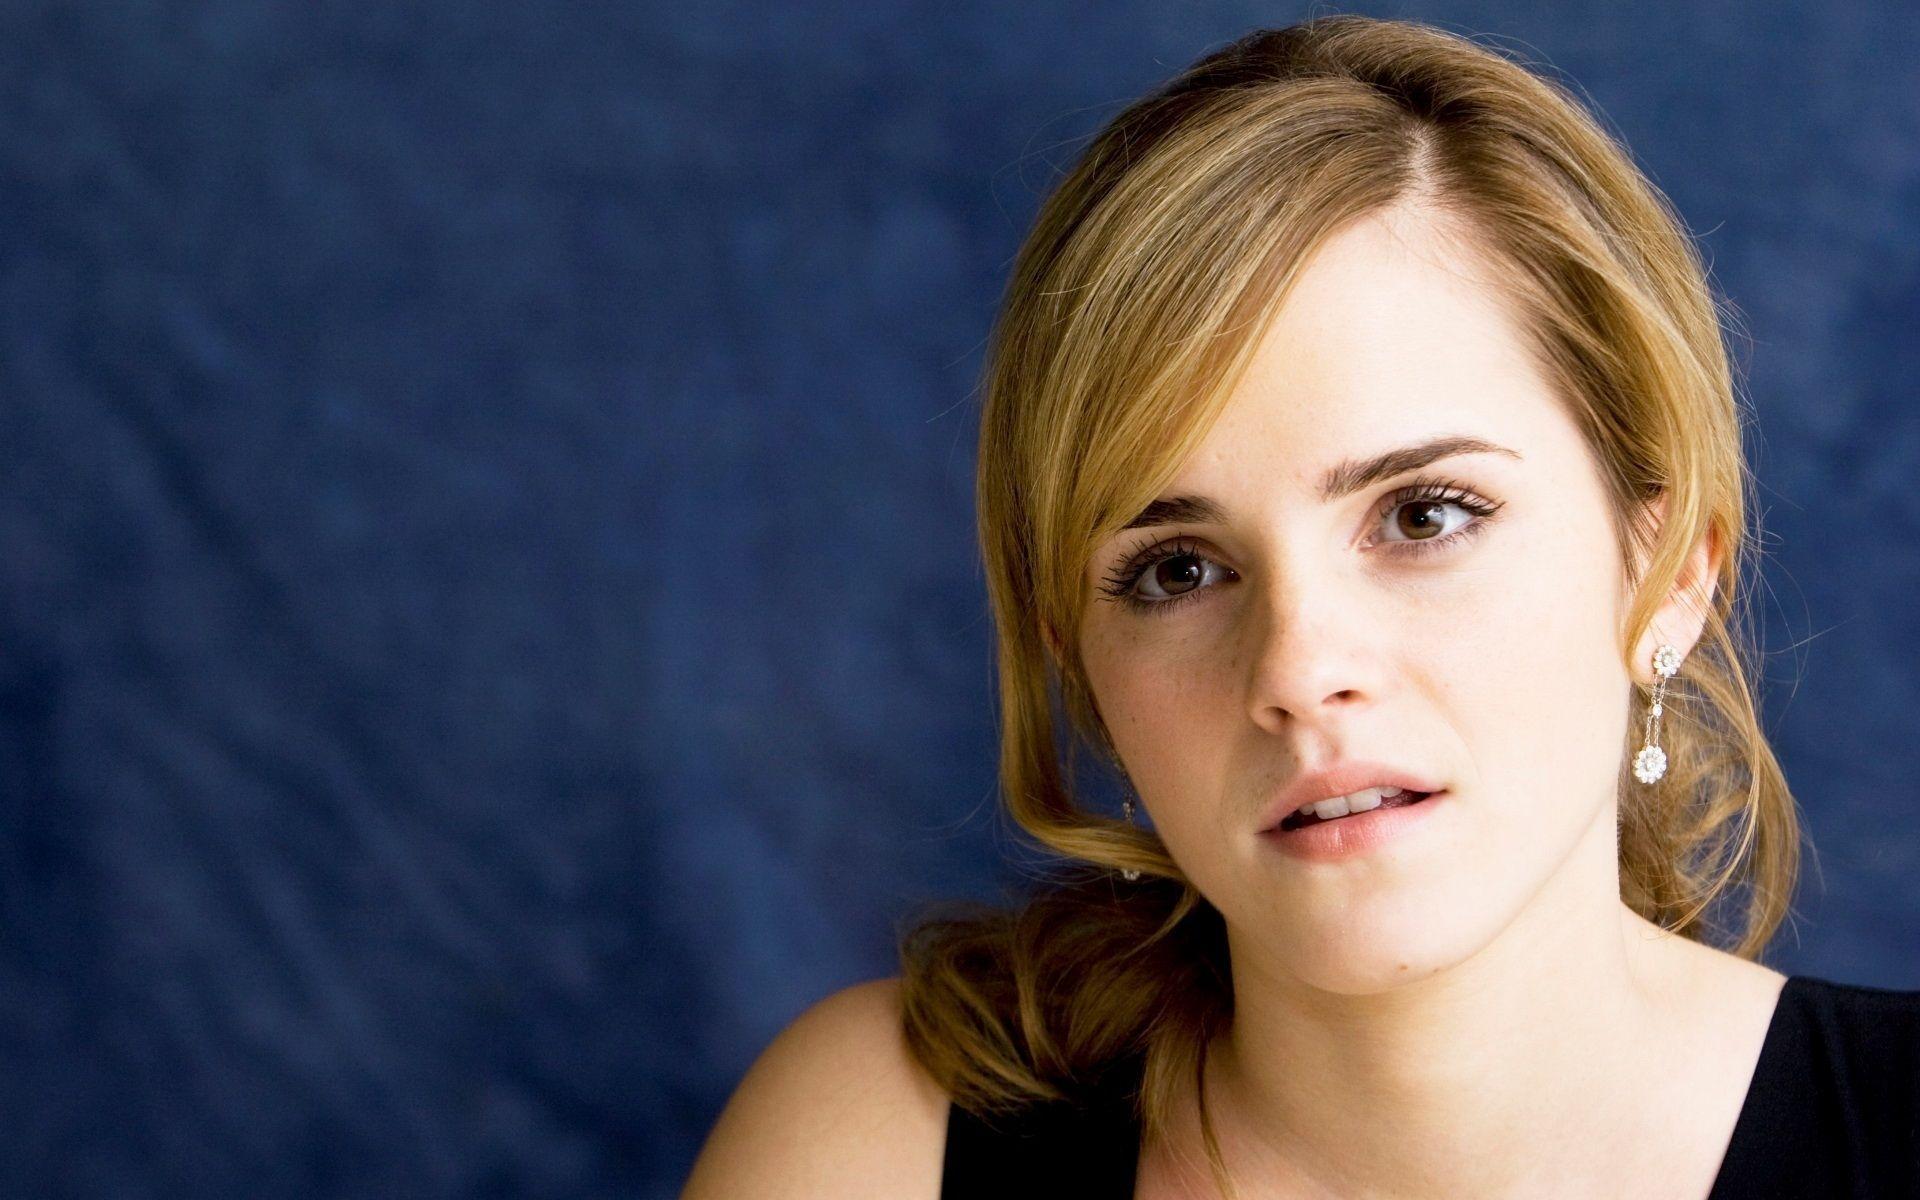 Hd wallpaper emma watson - Emma Watson Desktop Wallpapers 8 Emmawatsondesktopwallpapers Emmawatson Celebrities Babes Hotbabes